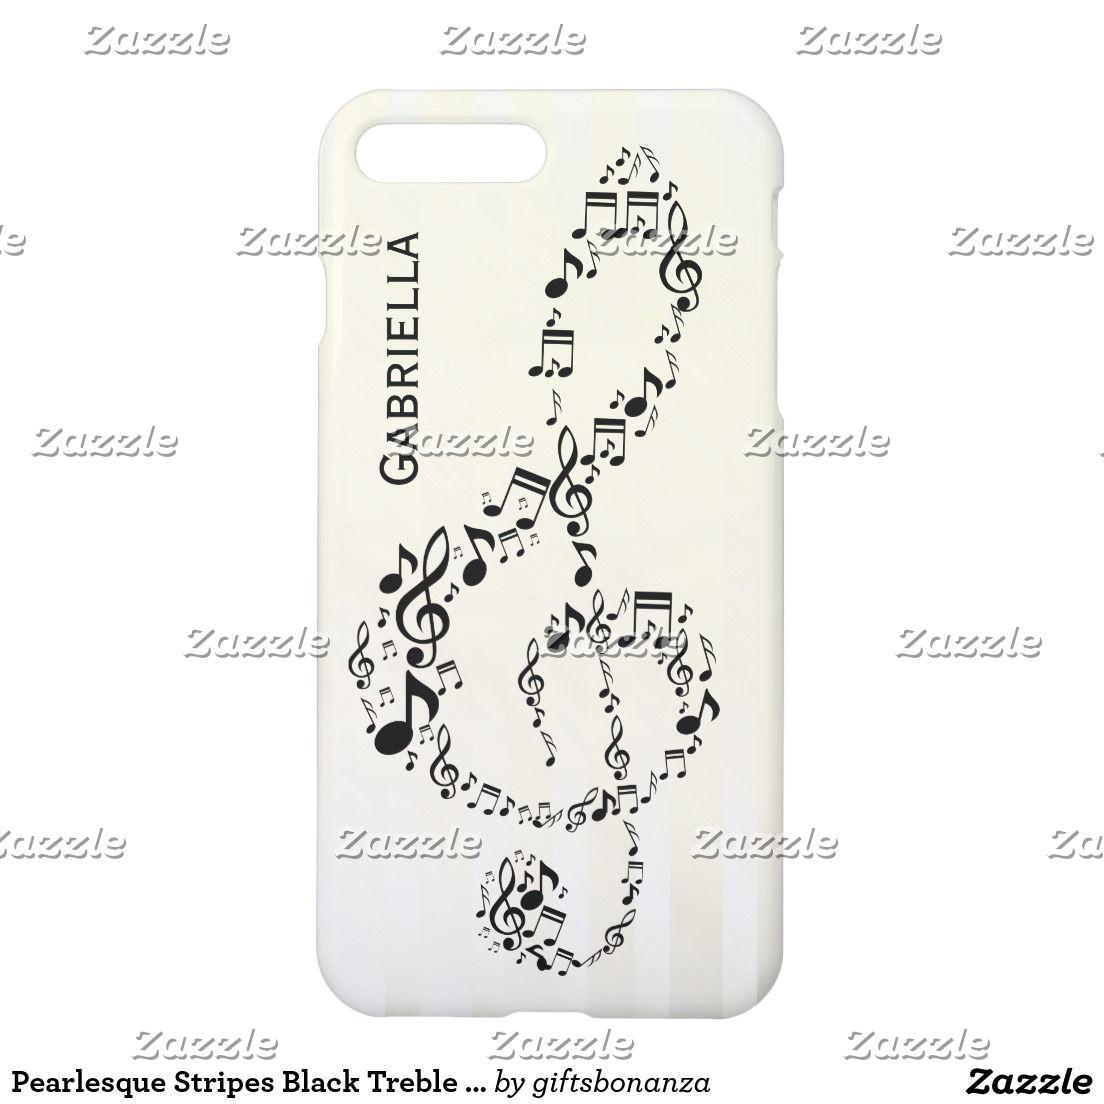 Pearlesque Stripes Black Treble Clef Music Notes iPhone 7 Plus Case